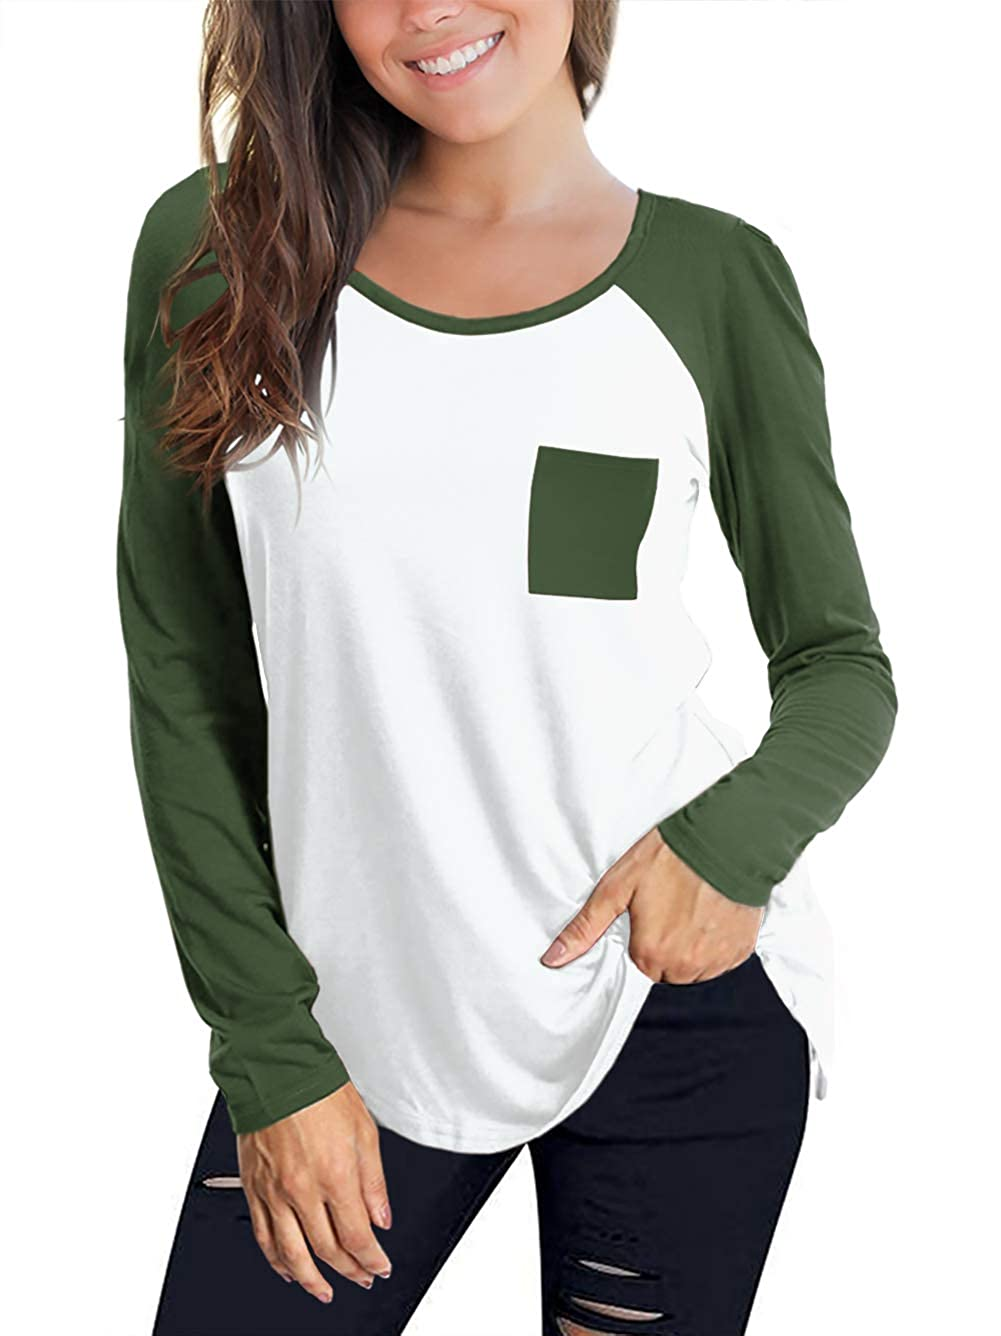 8X OBERTEILE PULLOVER Mädchen Gr. 80 langarm Shirts Frühling